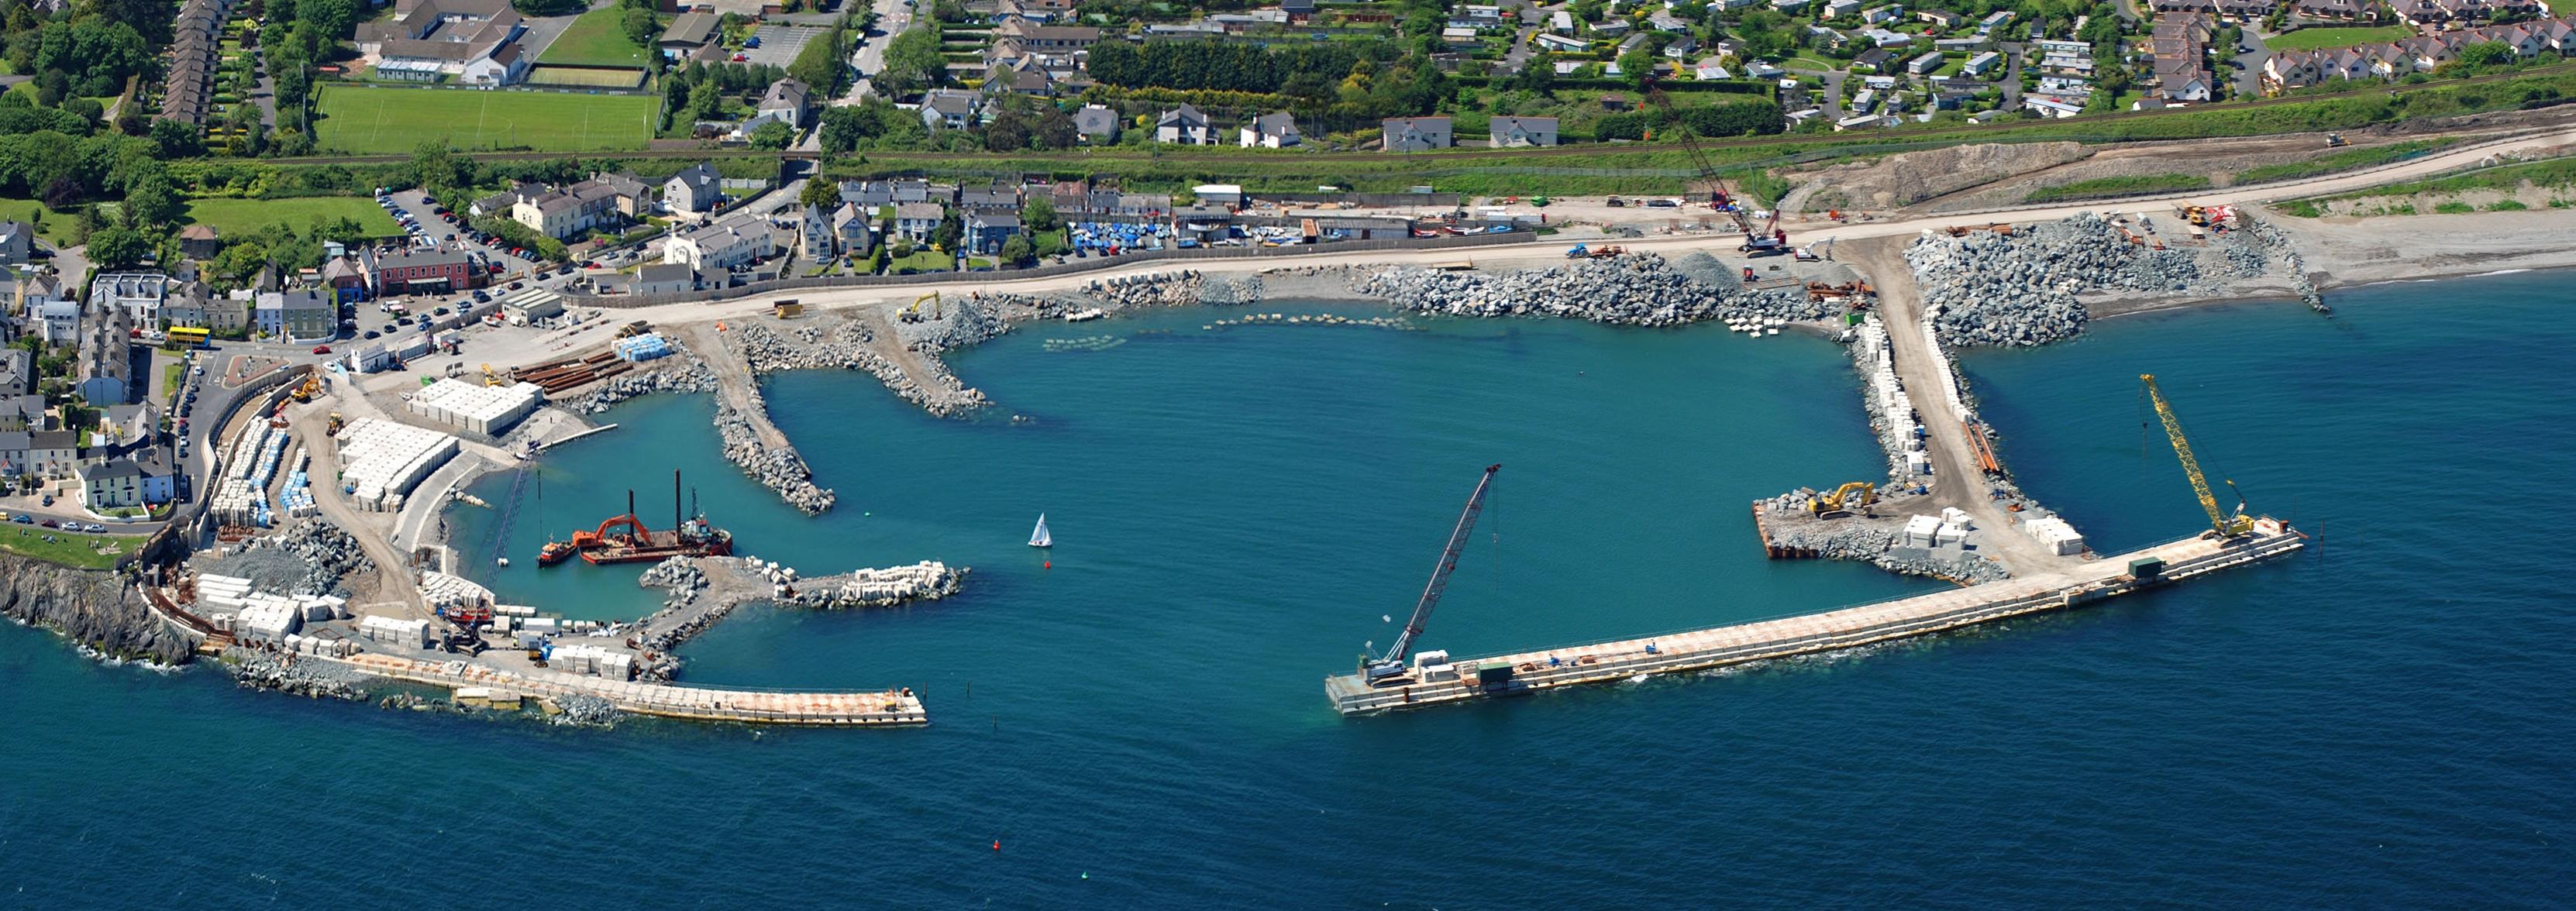 Harbour Project | Councillor Derek Mitchell